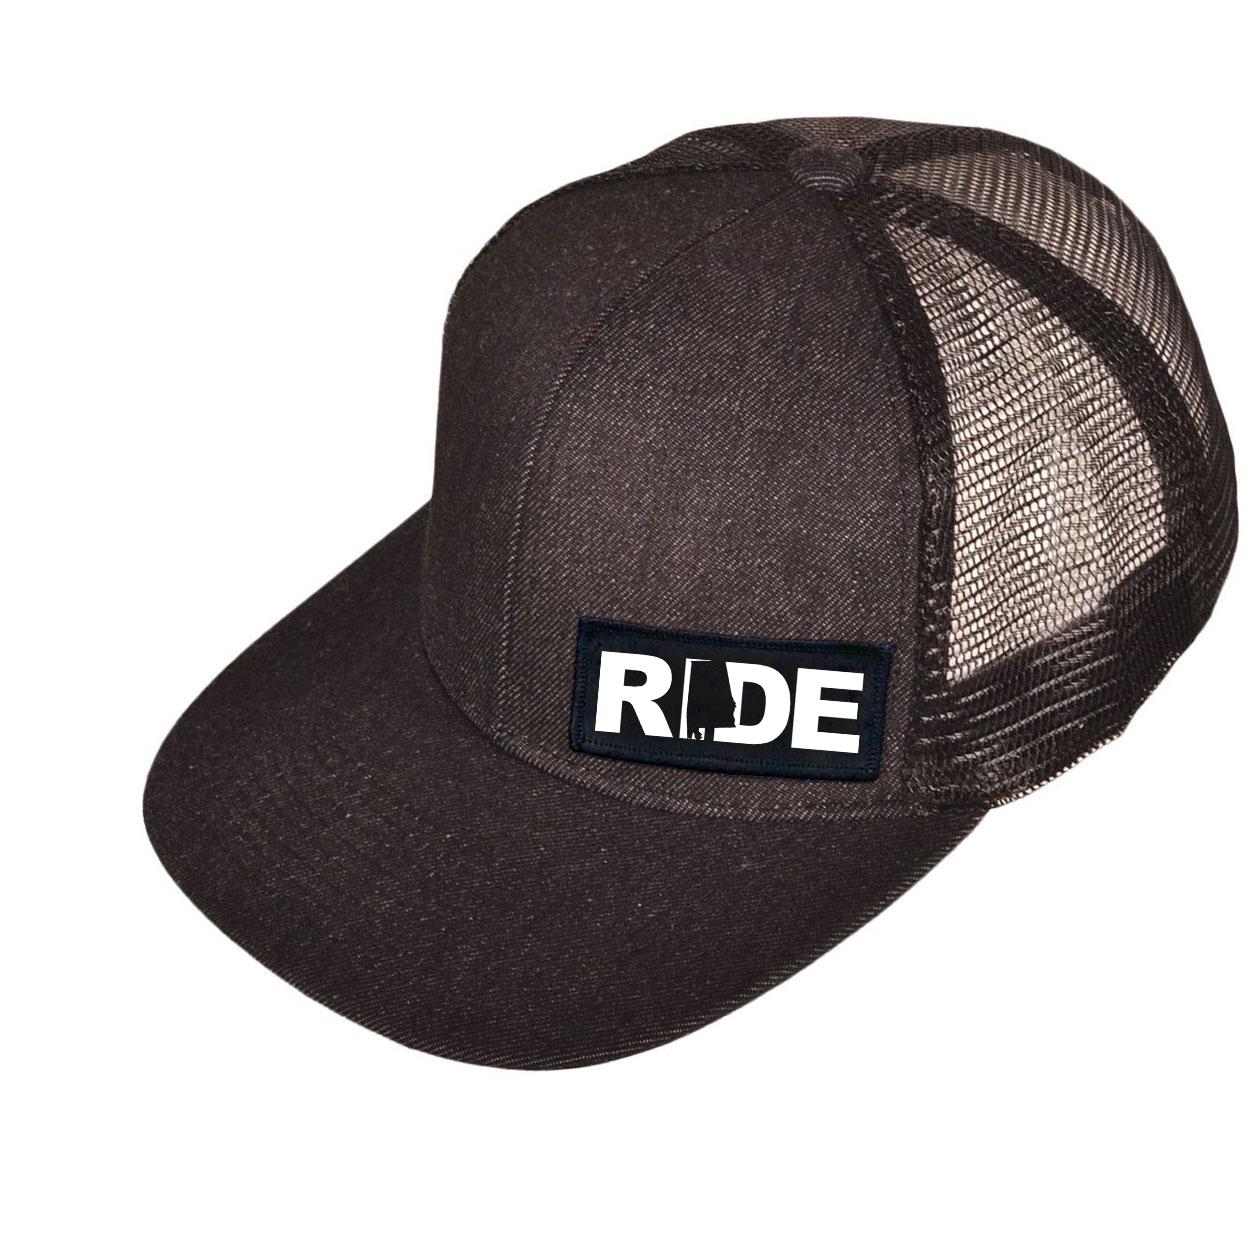 Ride Alabama Night Out Woven Patch Snapback Flat Brim Hat Black Denim (White Logo)